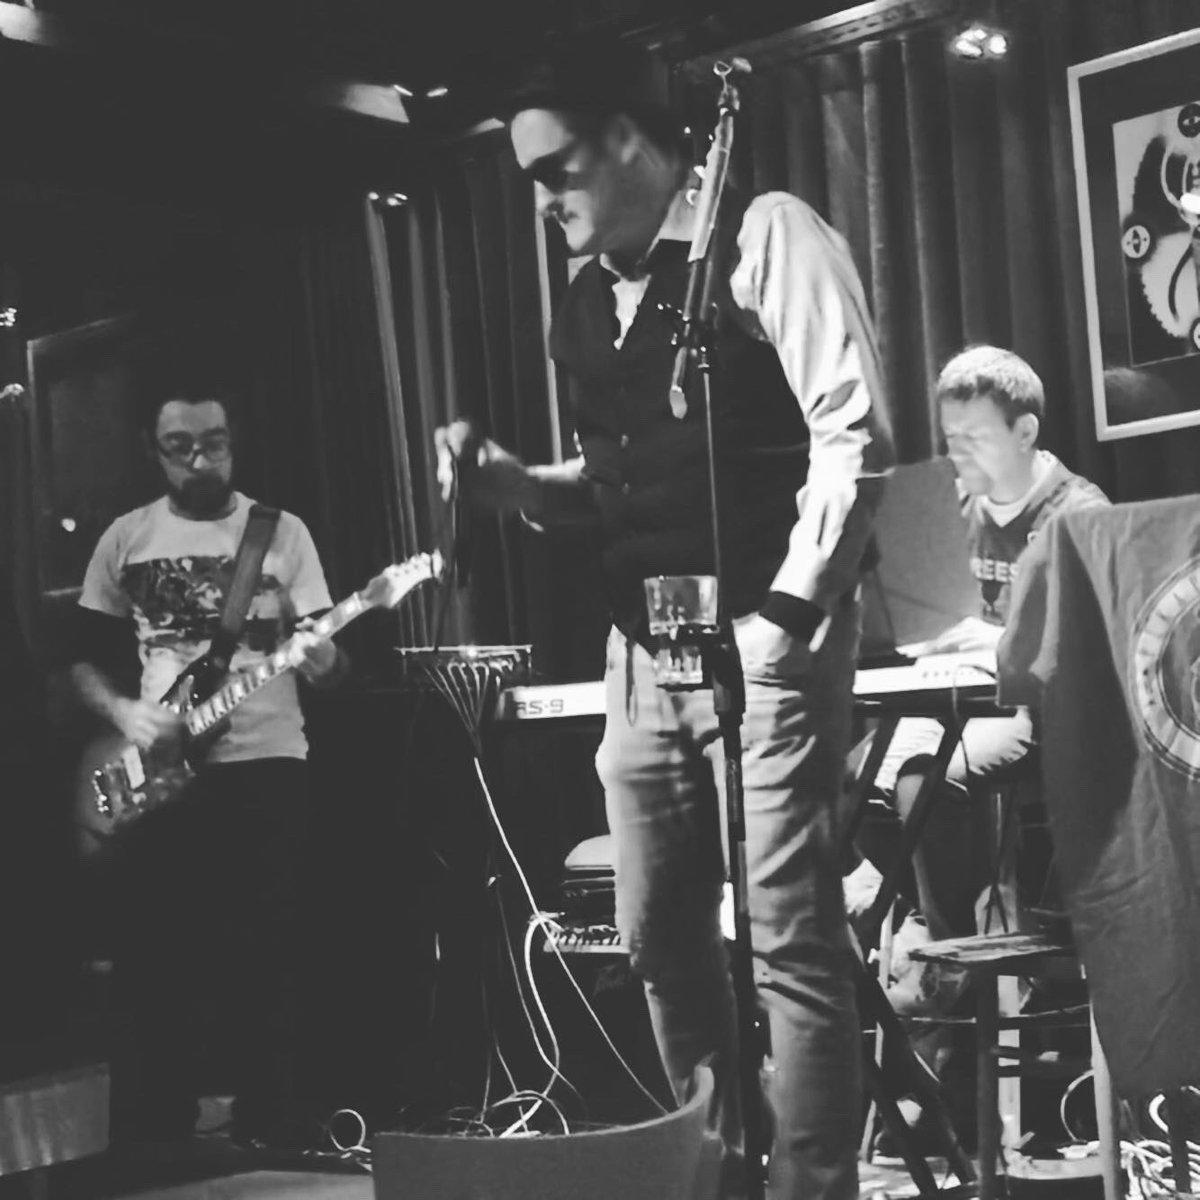 @b_pikapolonica from #novagorica #goriska #primorska #live #concert #ljubljana #slovenia #slovenija #ifeelslovenia @prulcek #photo by @dunjaursic #acoustic #akustika #acustico #blues #rock #party #band @aljazorel @daniele_coslovich @matej_peternelj #sunglasses #insta #pic.twitter.com/sCCenSAILm